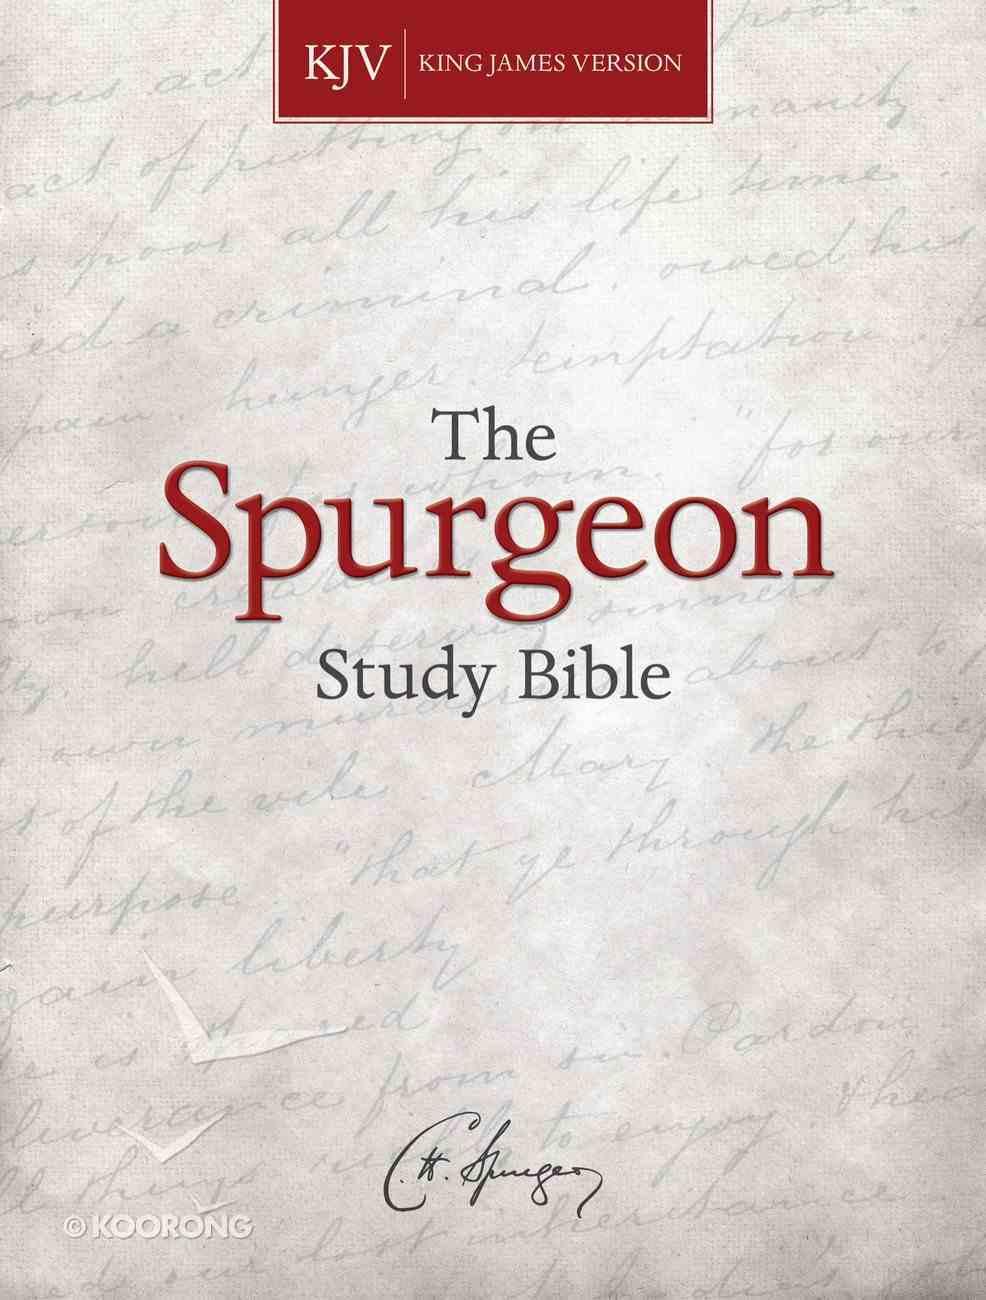 KJV Spurgeon Study Bible eBook